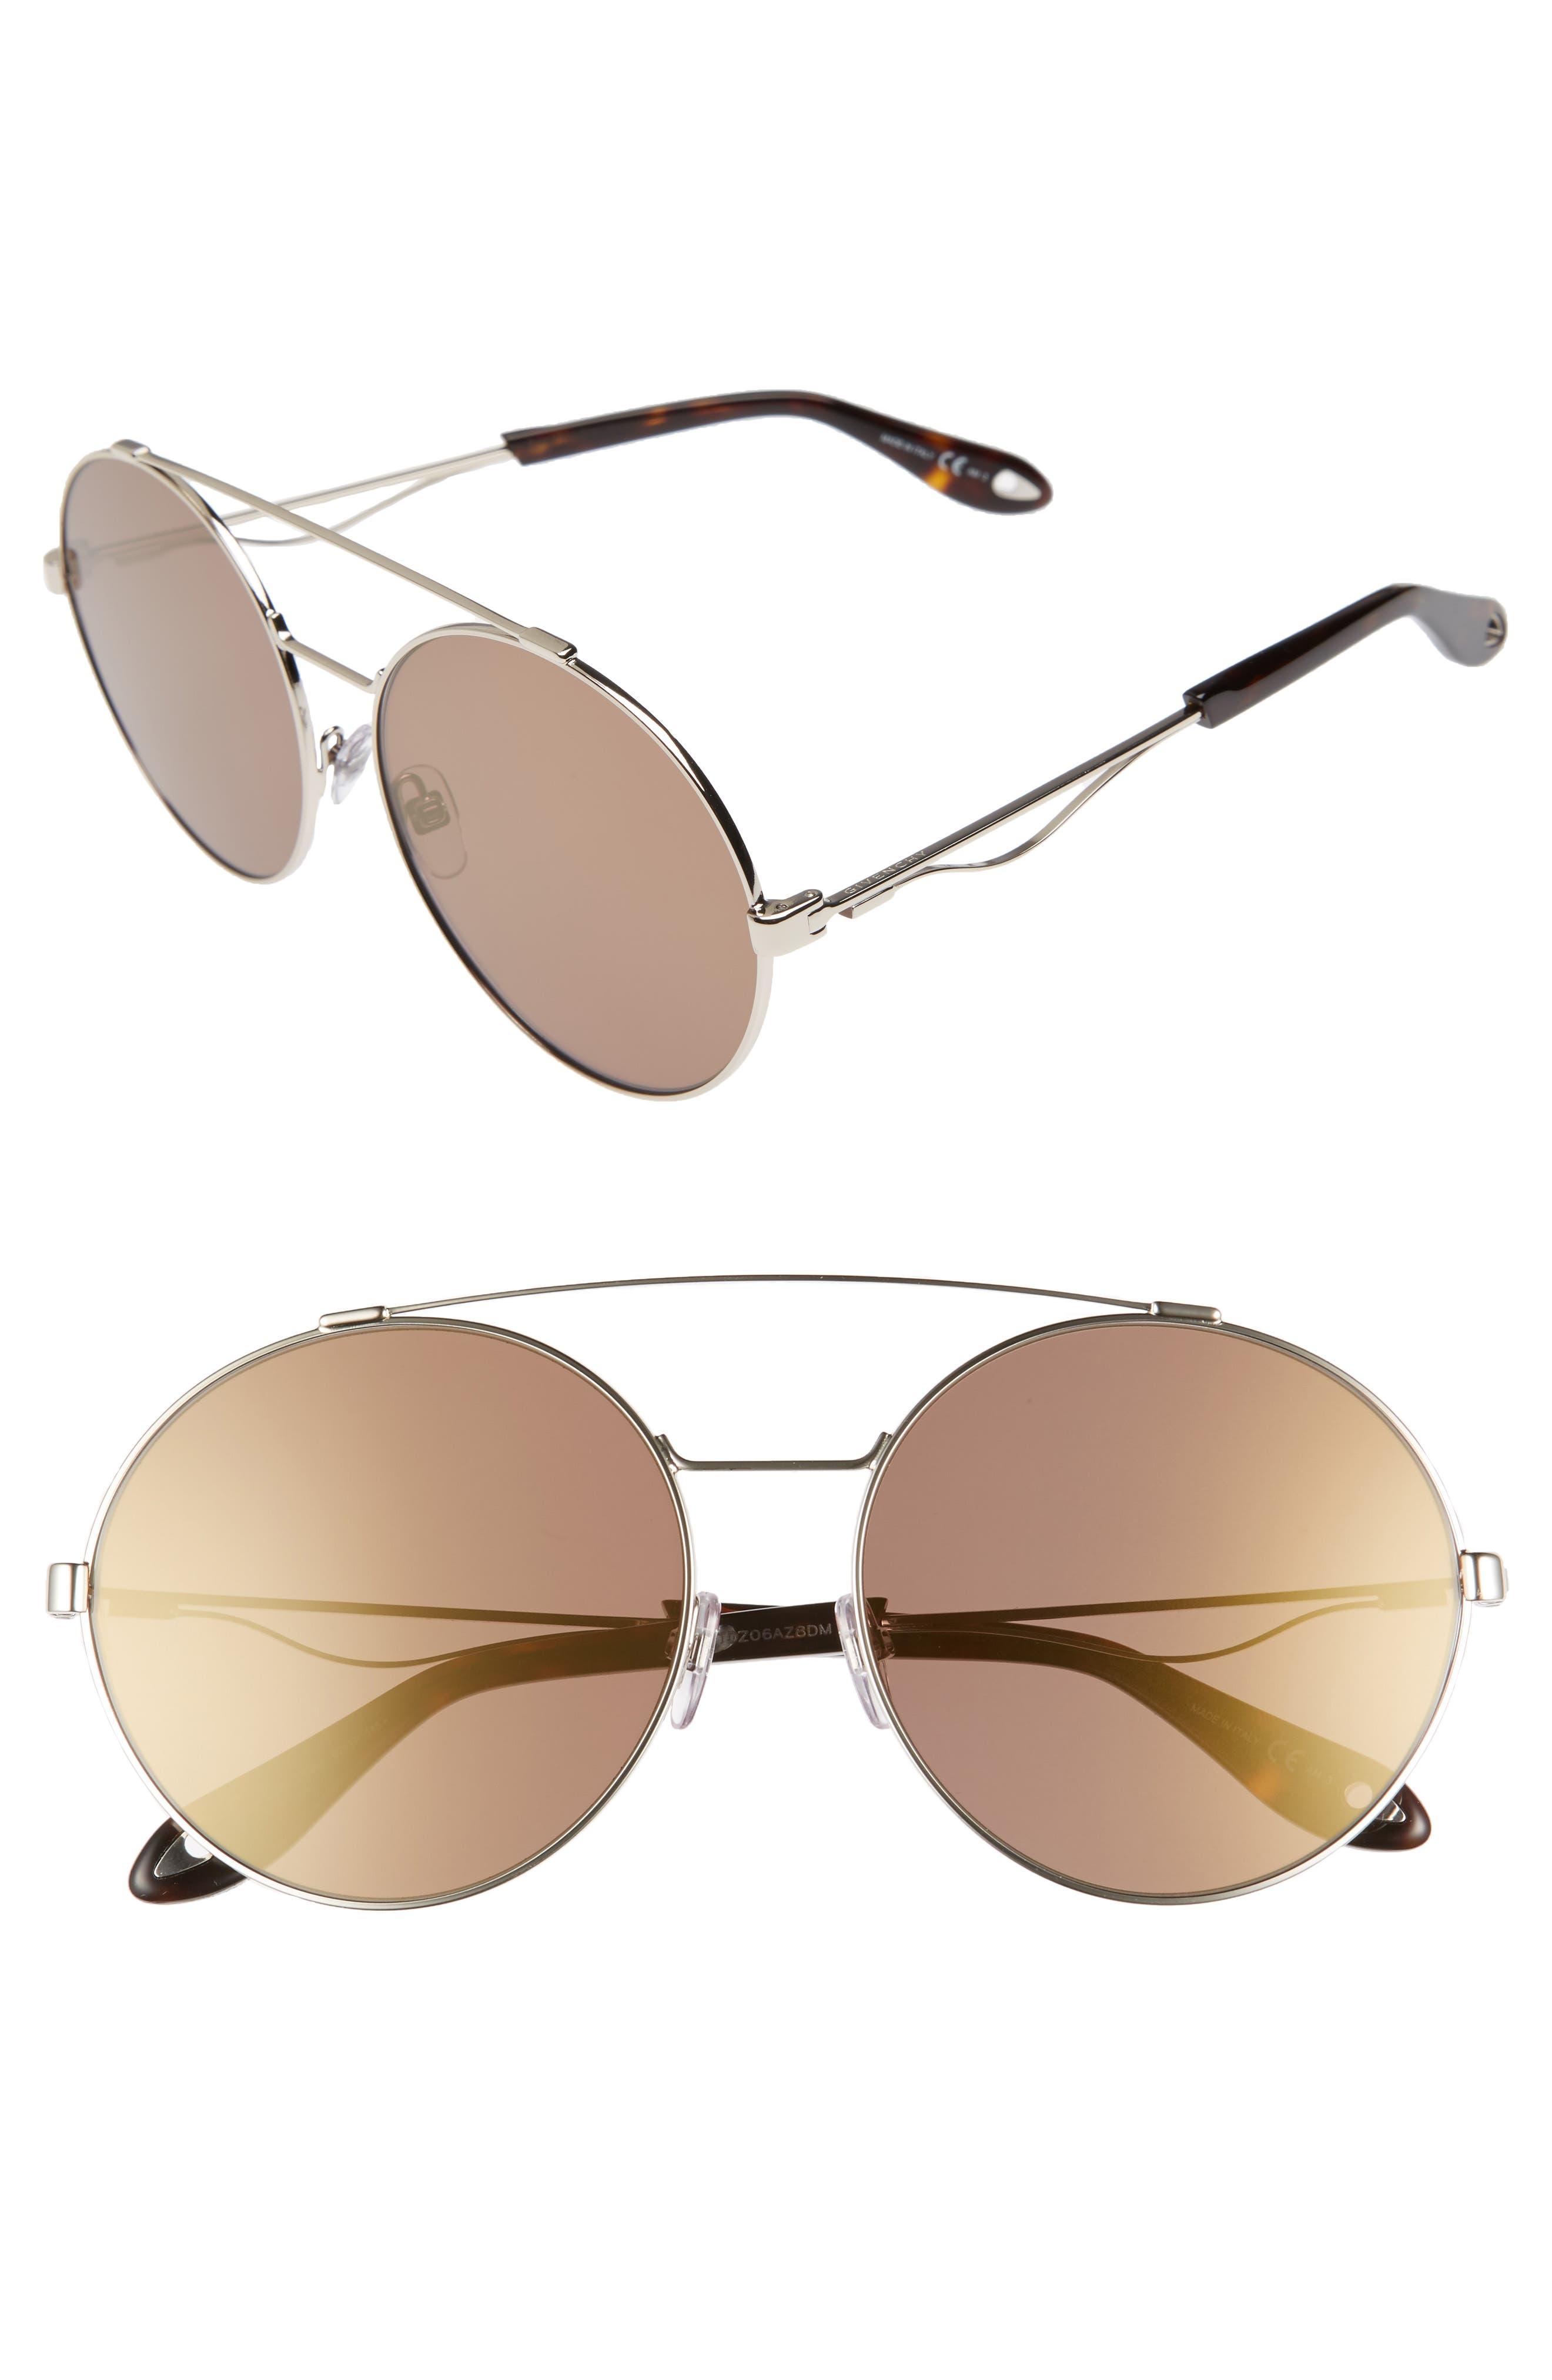 62mm Oversize Round Sunglasses,                             Main thumbnail 1, color,                             LIGHT GOLD